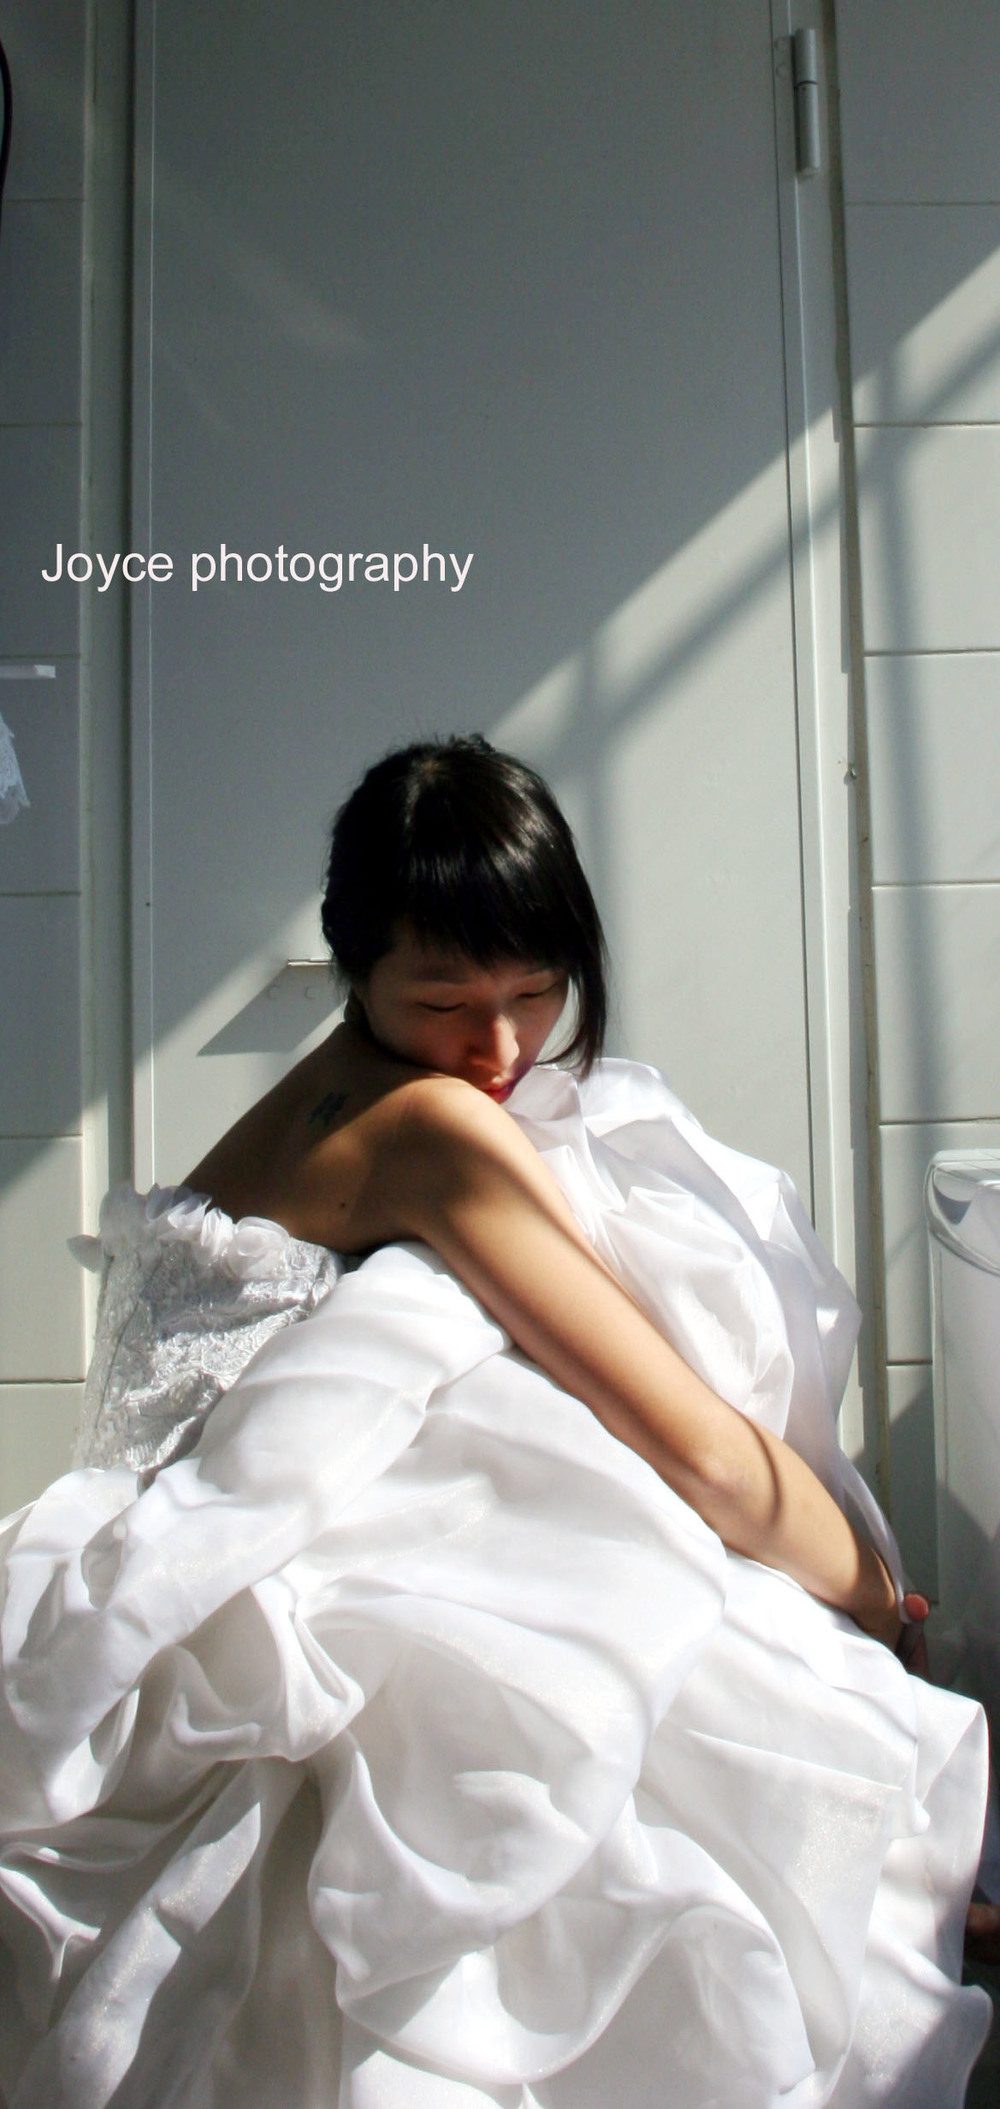 JC CREATIVE 女性攝影師   時尚 台北推薦婚攝 女力 人像寫真 女性成長 攝影治療 影像 生命    VOGUE TAIWAN 美人會 voguebeauty 訣竅公開 藝術自拍 手機自拍 教學 本質 影像療育 圖像 (20.jpg